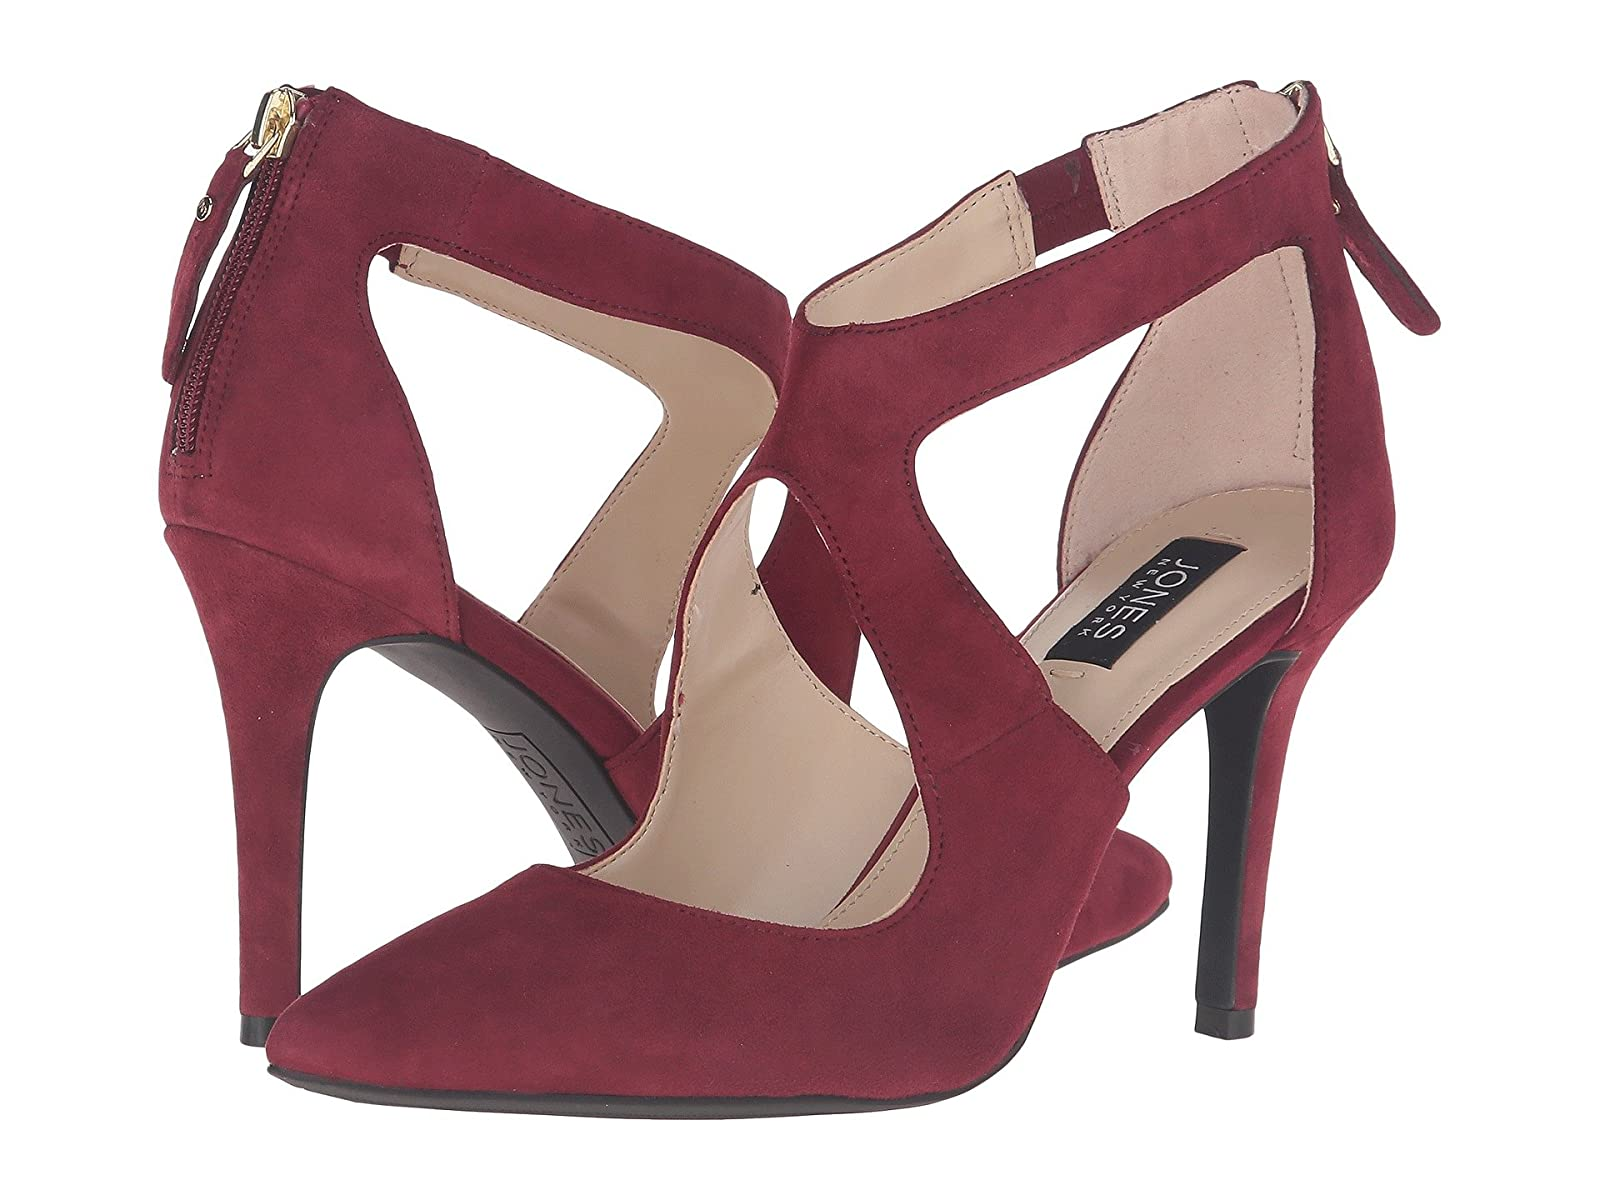 Jones New York ChristieCheap and distinctive eye-catching shoes